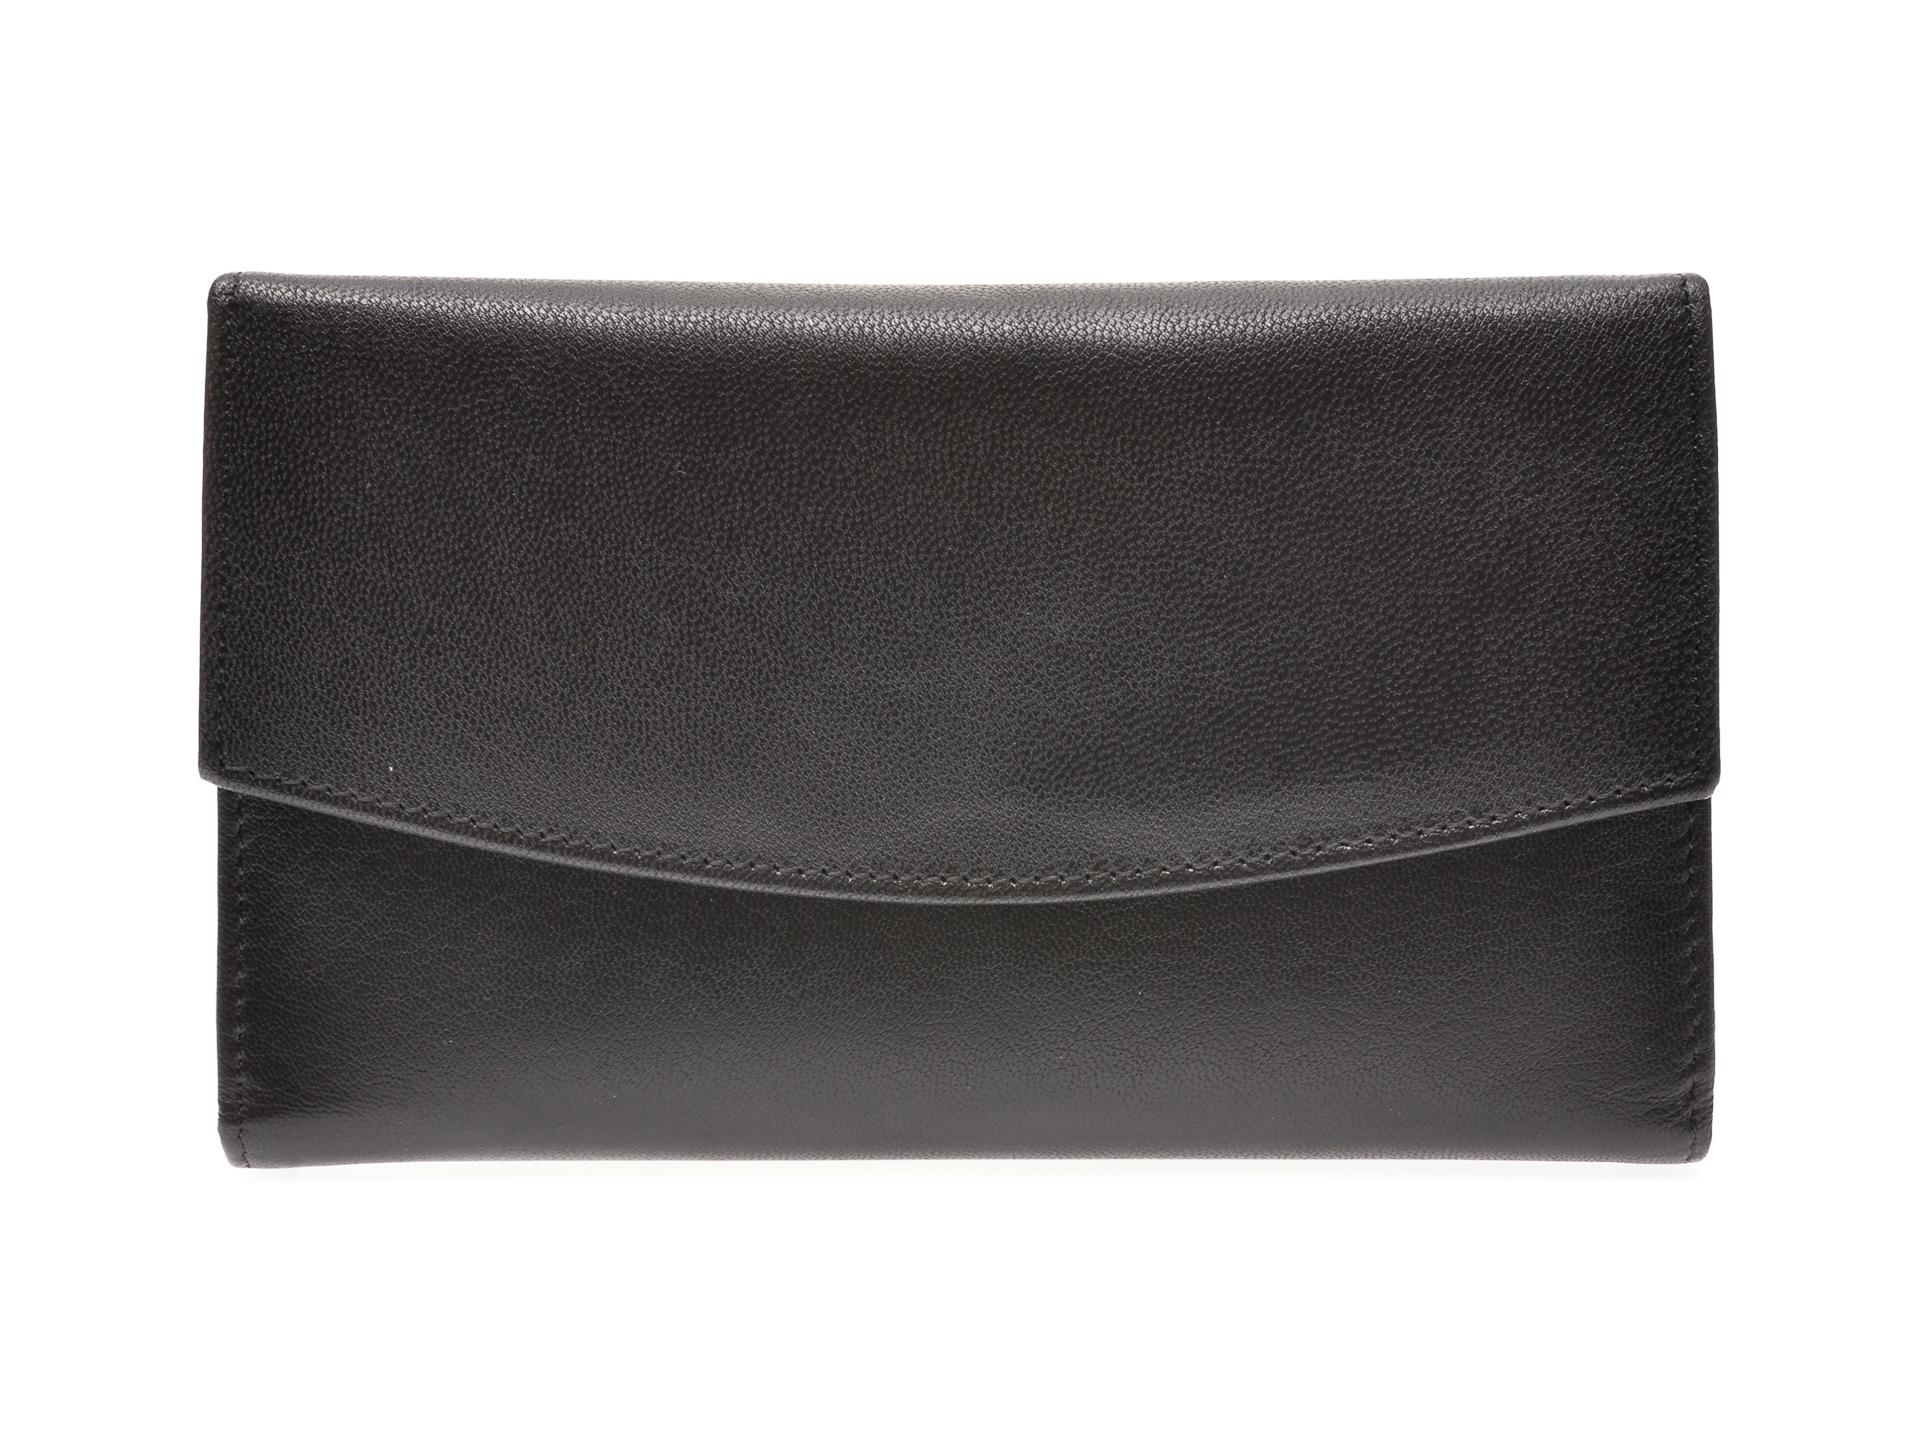 Portofel EPICA negru, 107, din piele naturala imagine